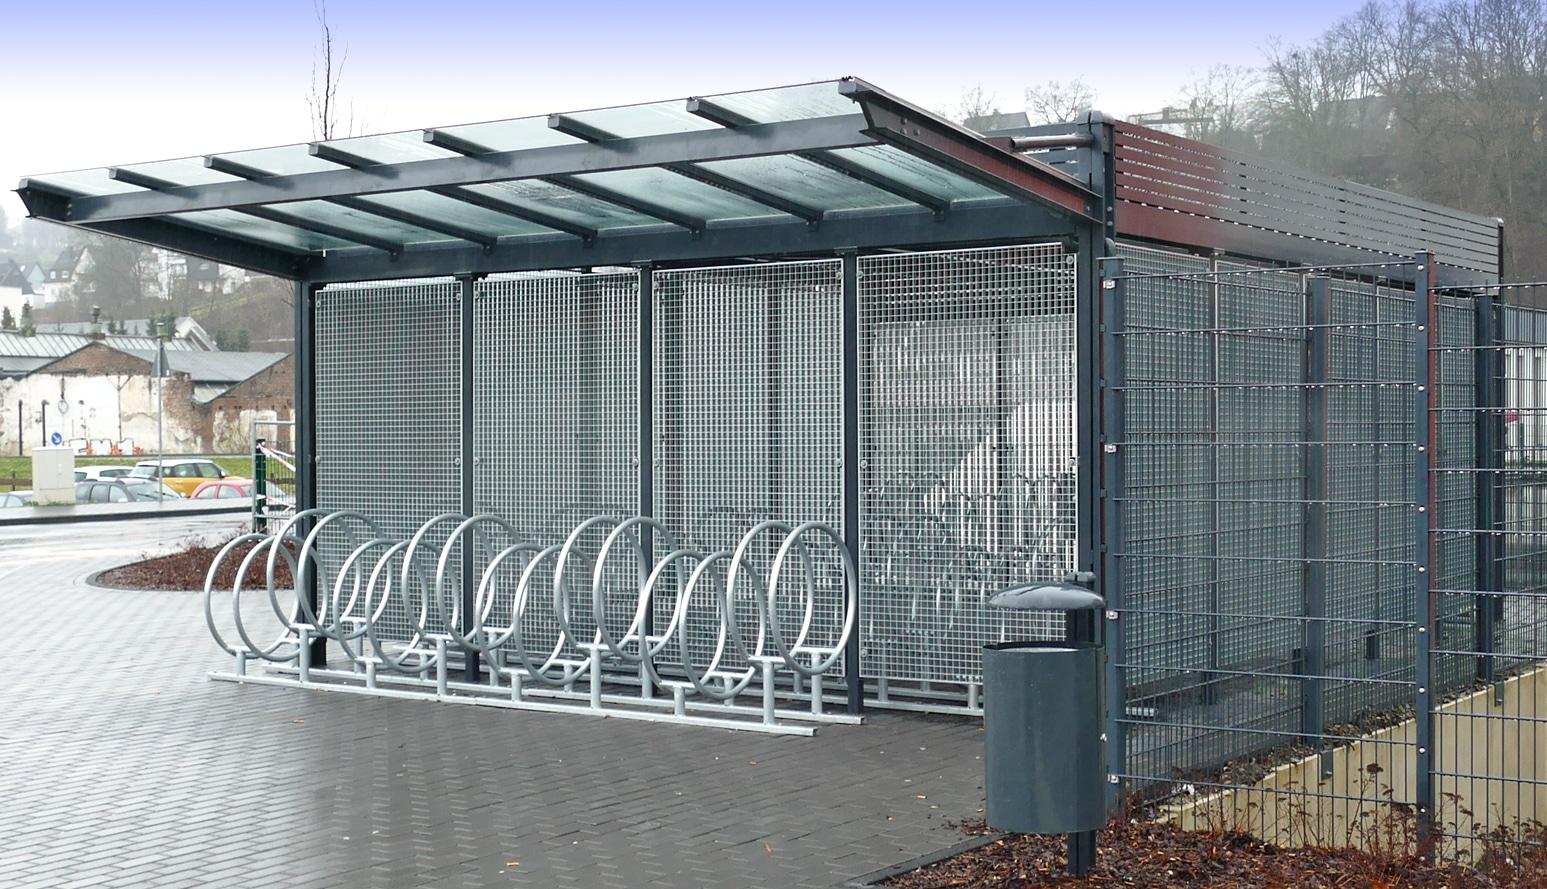 Überdachung forum d1 | bike and ride gmbh